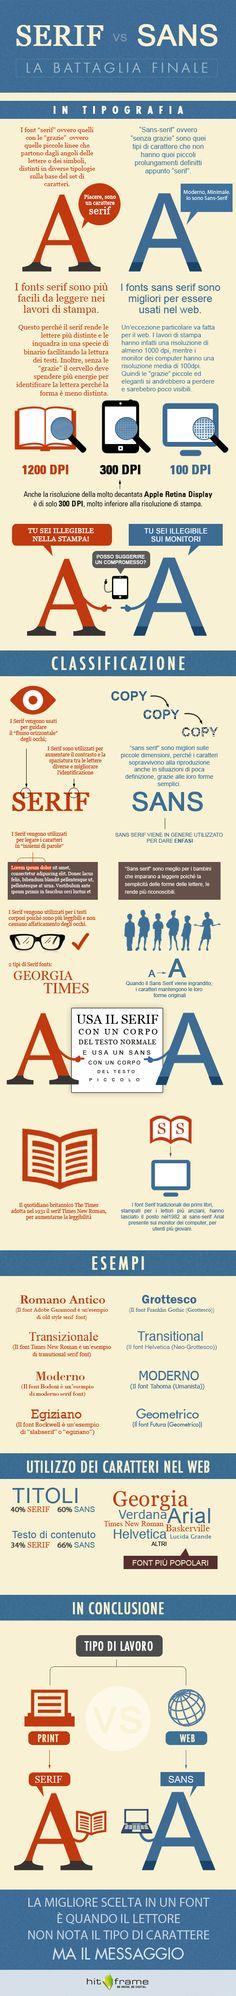 Infografica - Serif VS Sans